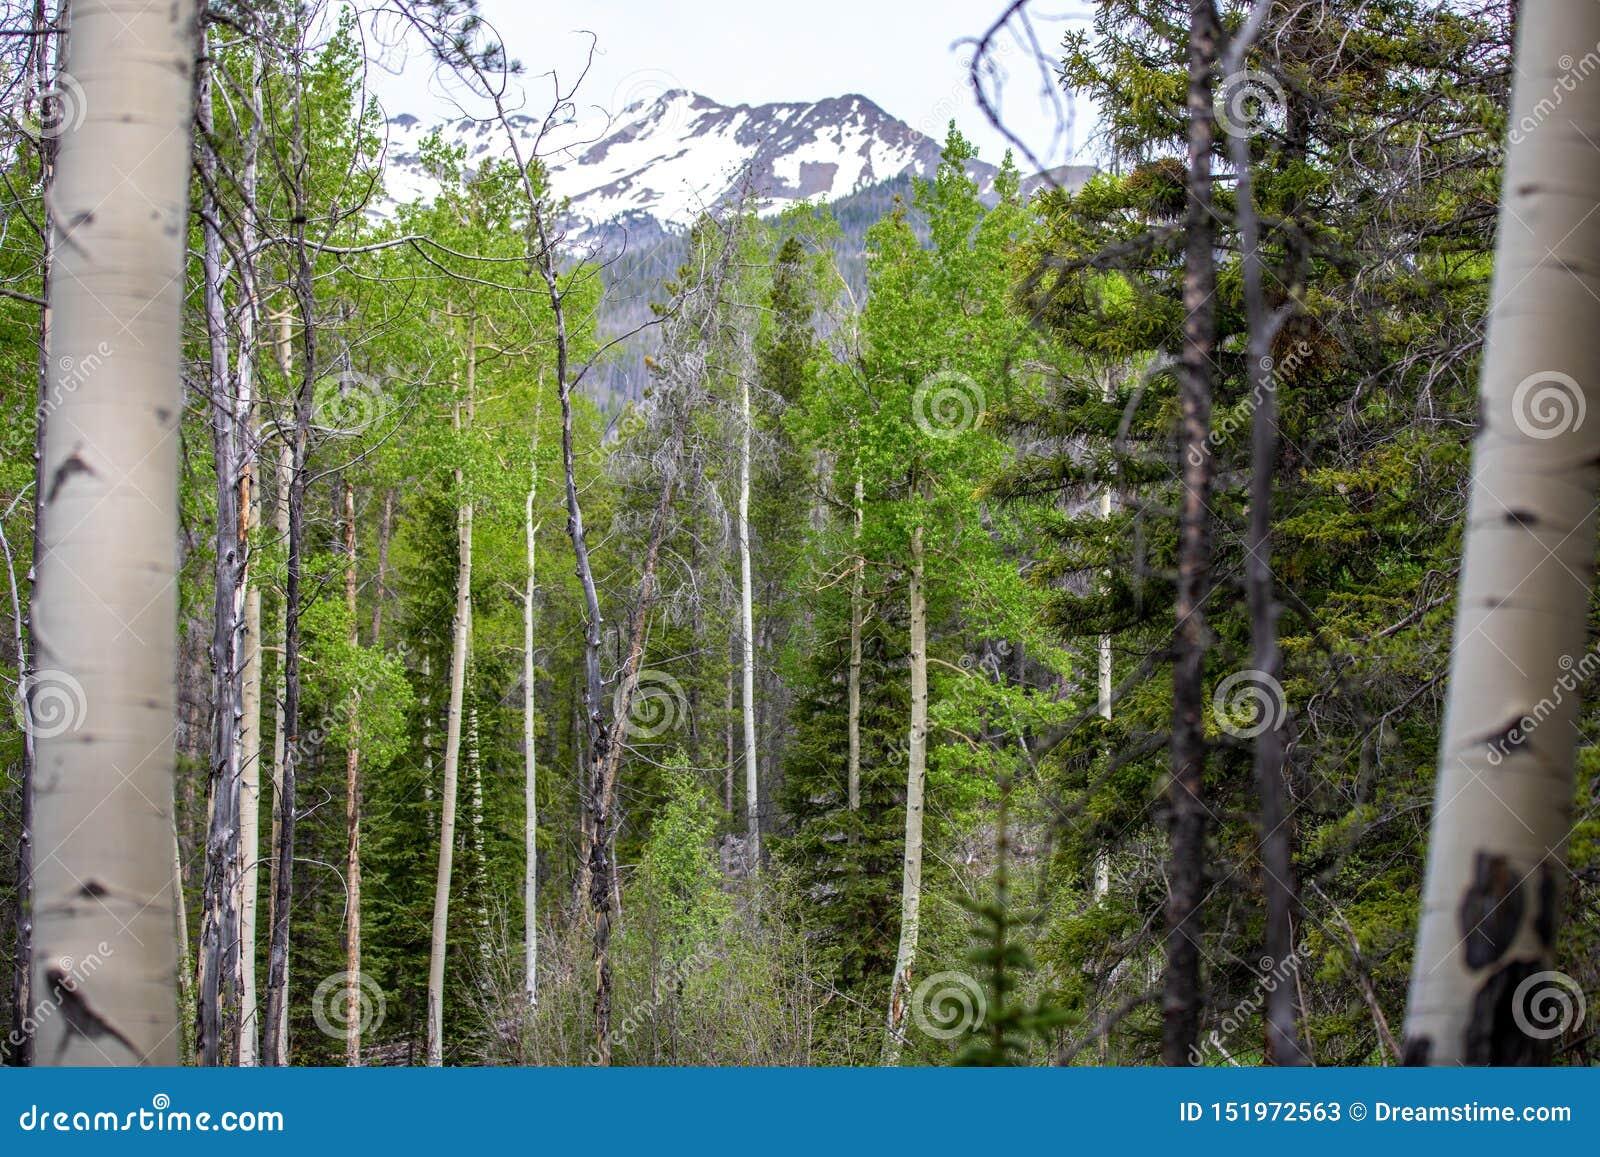 Aspen Trees Framing een Sneeuwbergpiek in Rocky Mountain National Park